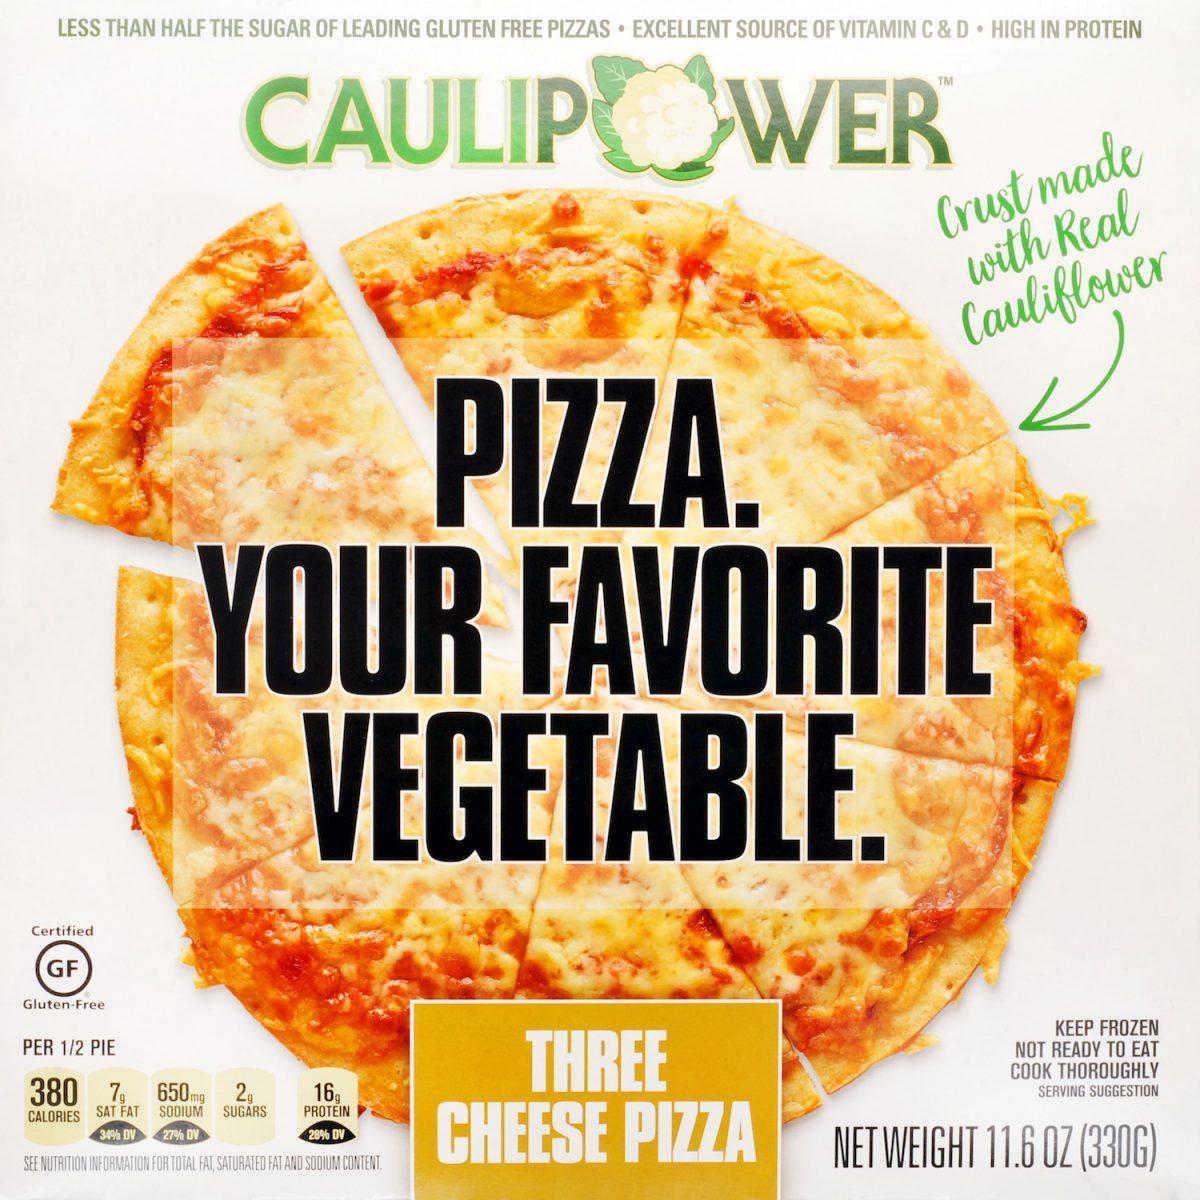 Frozen Cauliflower Pizza  Caulipower How This Corporate Executive Left Her